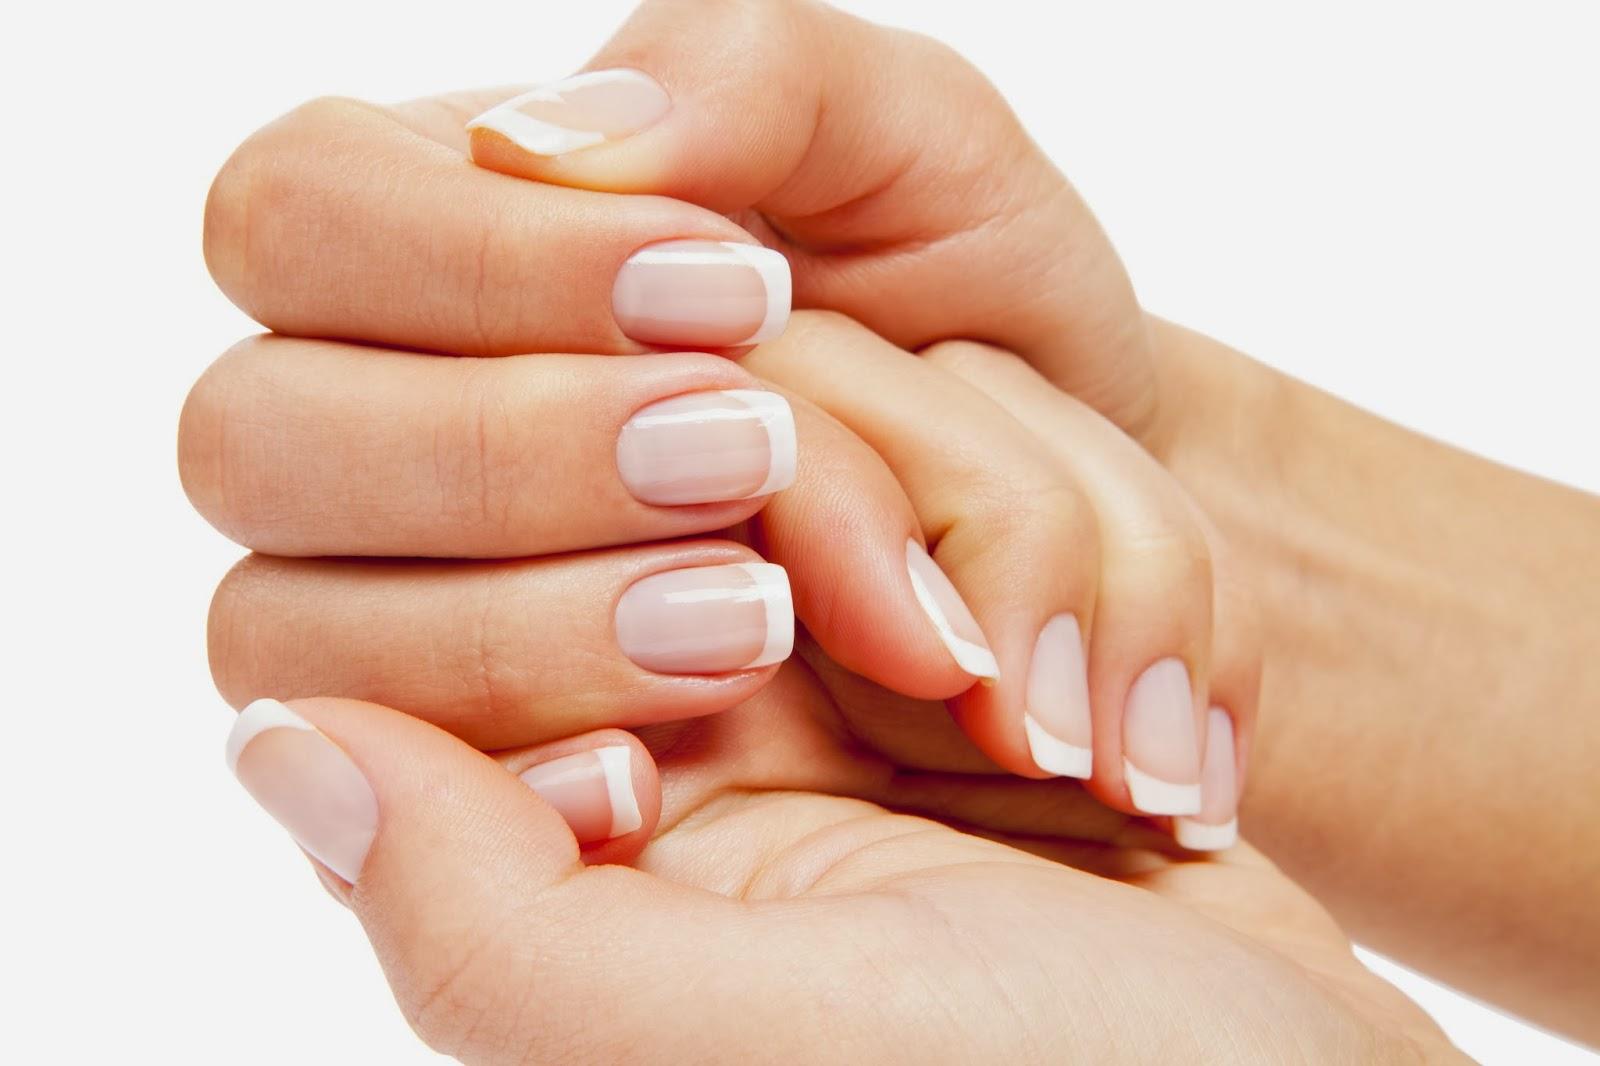 Ricostruzione Unghie In Gel Inefficace Che Fare Beauty Blog